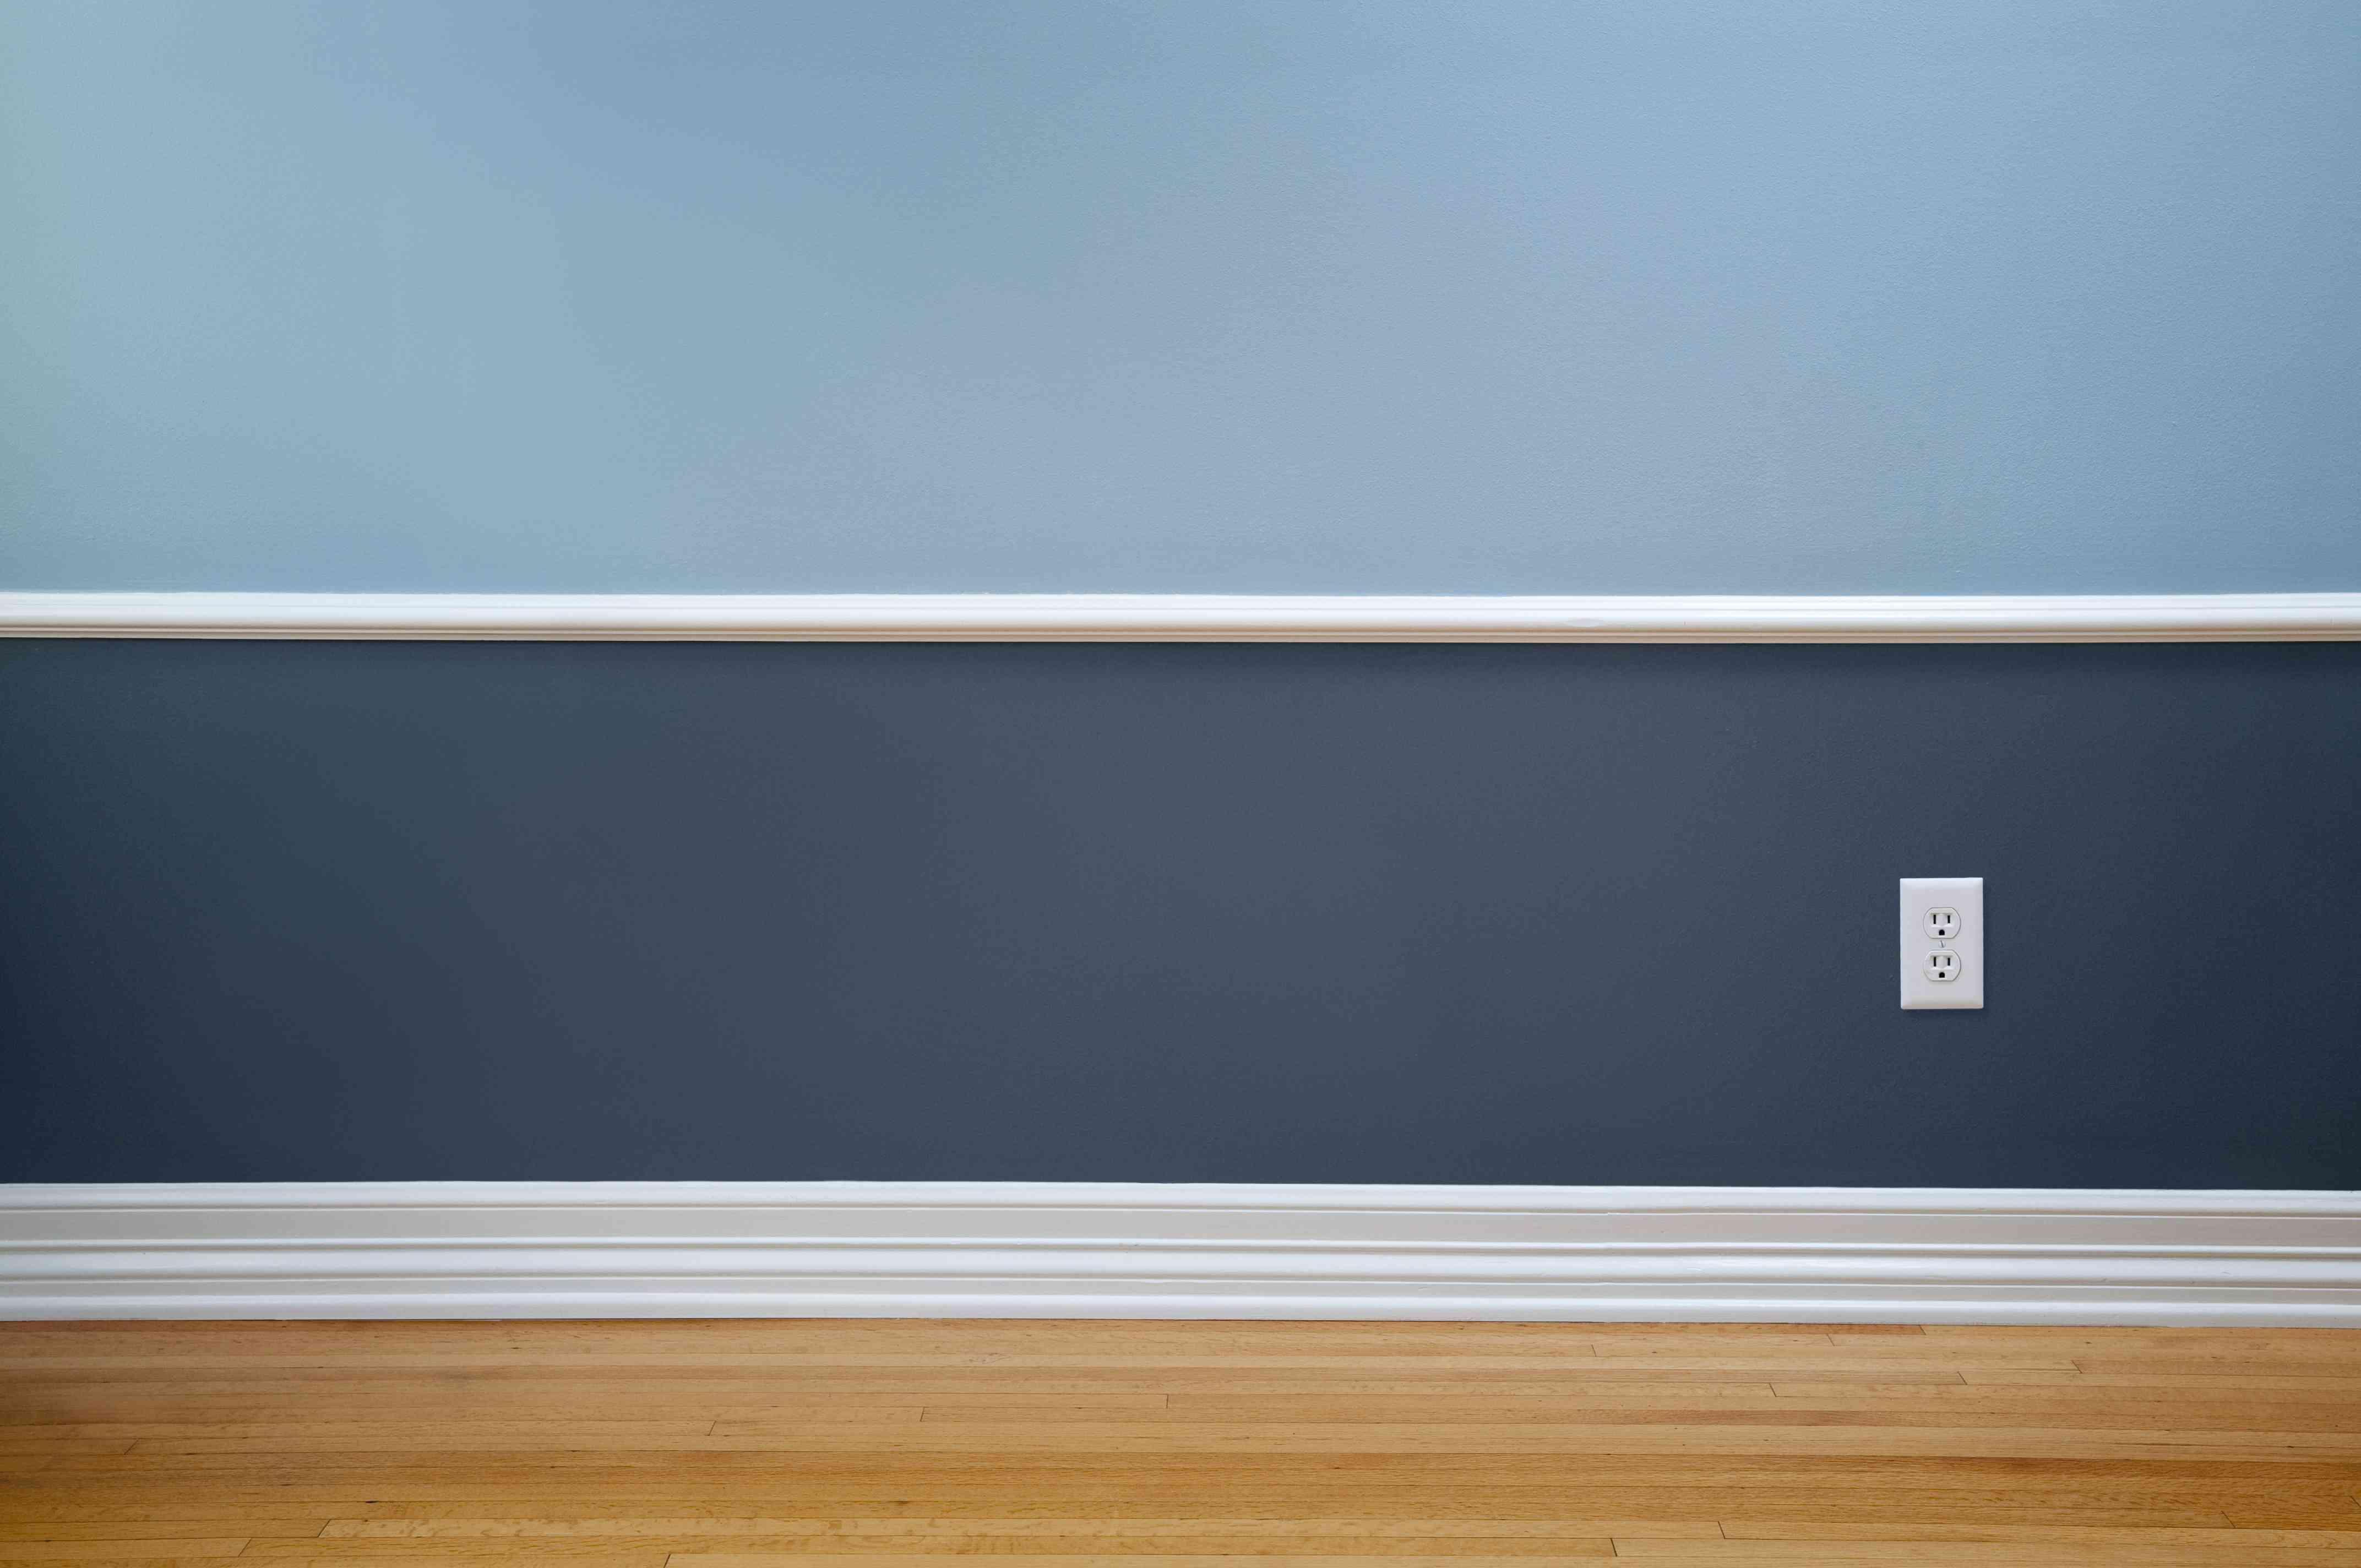 Empty Room With Wall Plug